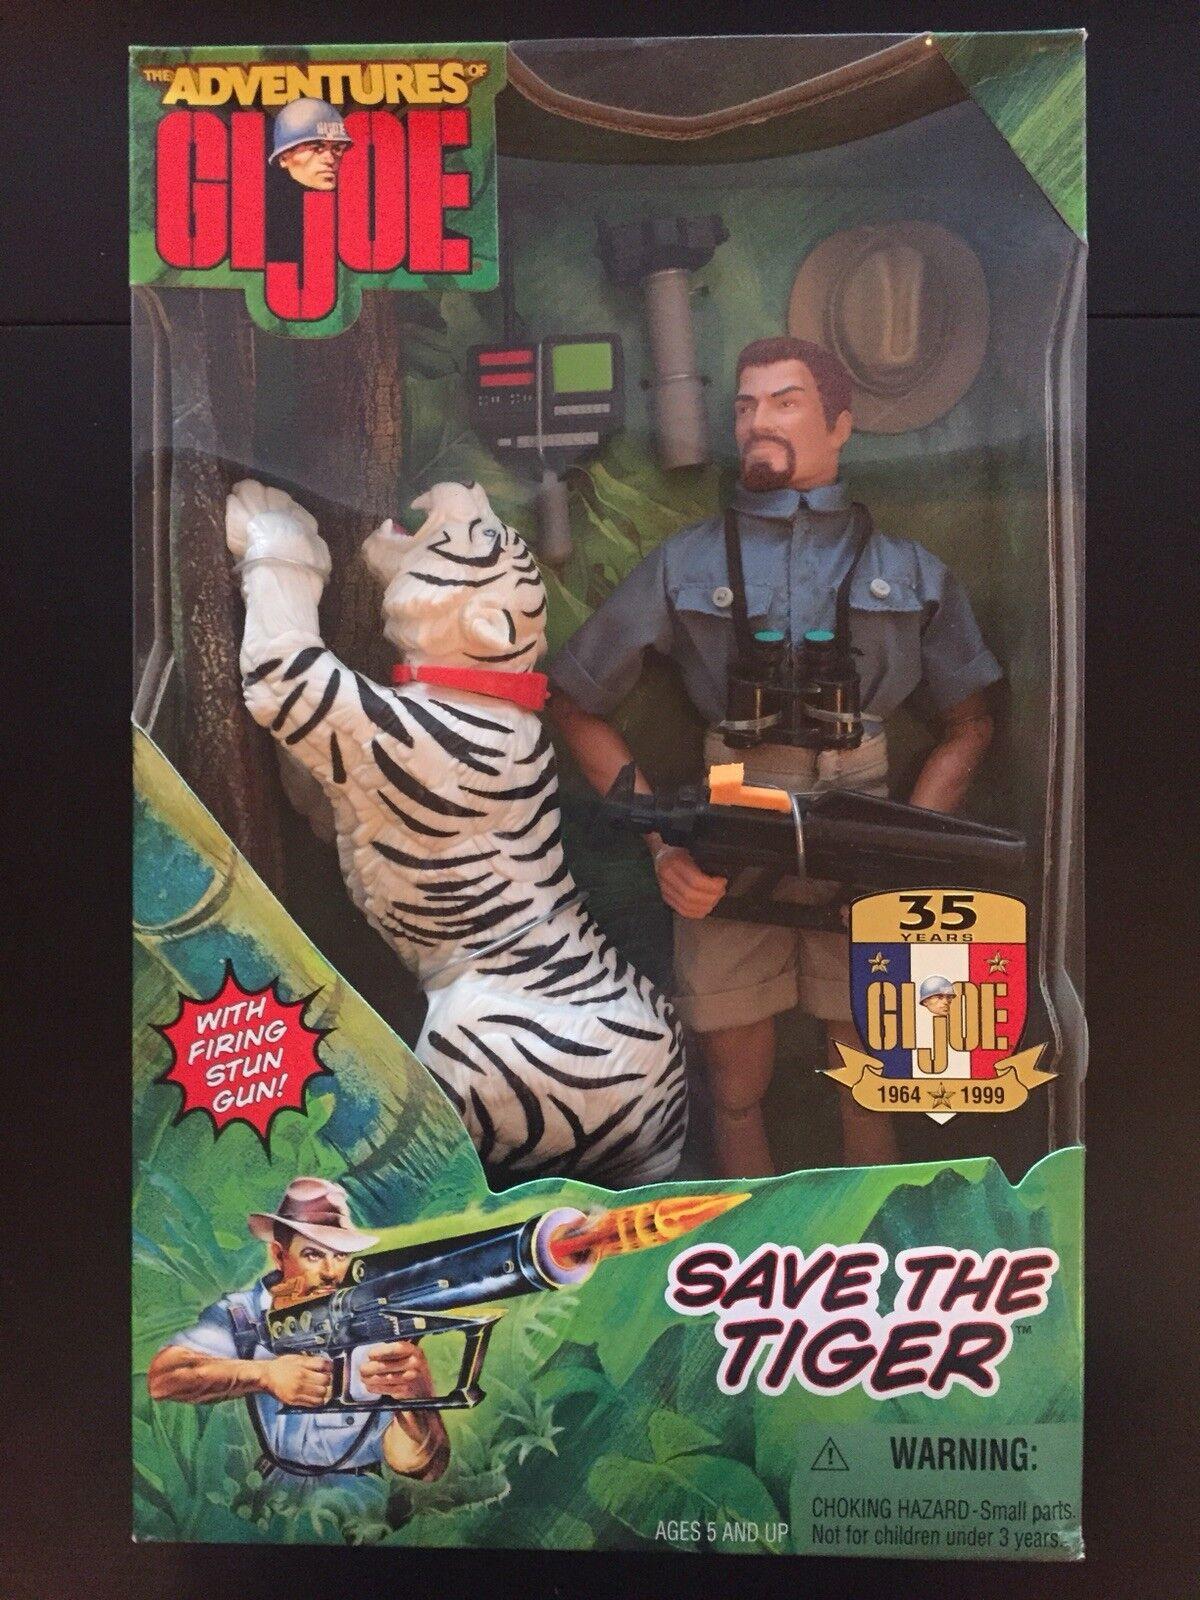 THE ADVENTURES OF GI JOE SAVE THE TIGER